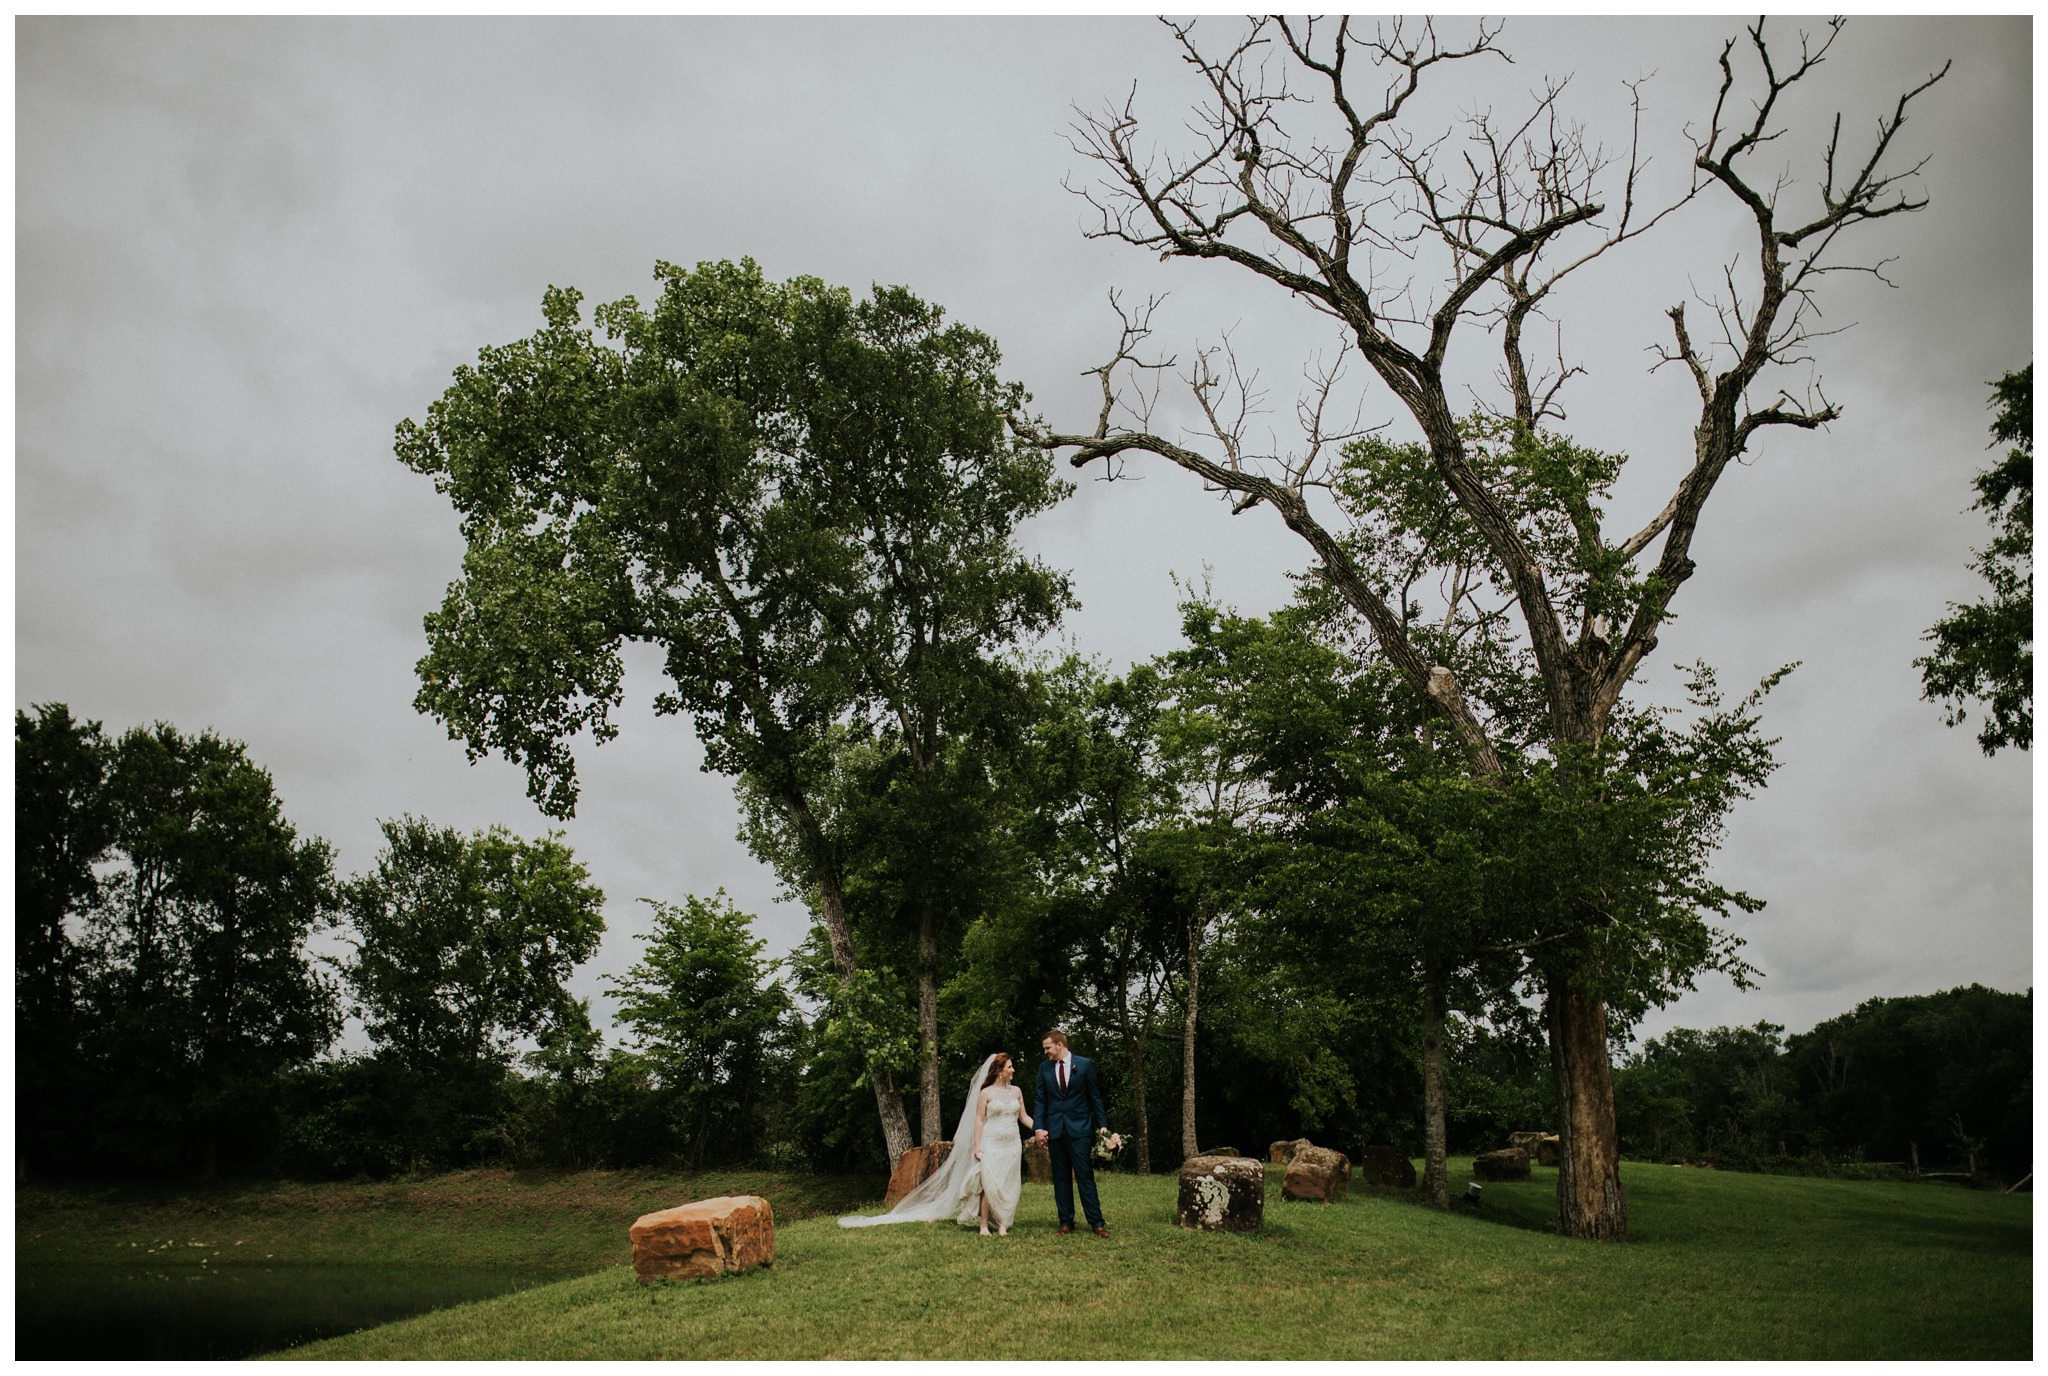 Summertime Olde Dobbin Station - Magnolia Wedding - The Woodlands Texas Wedding Photographer-2471.jpg